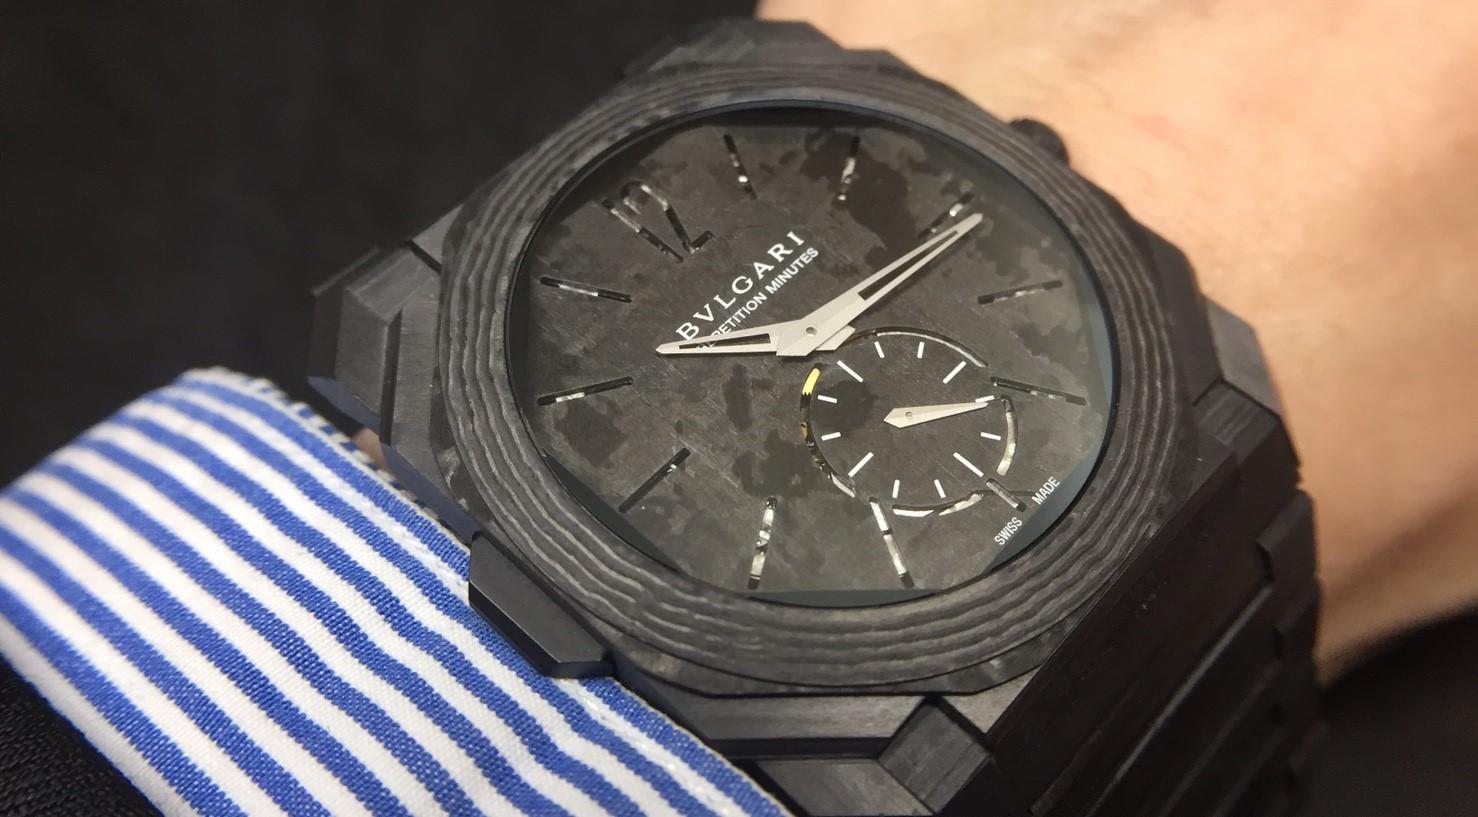 【Baselworld 2018現場直擊】聲學、美學與高科技的頂級製錶工藝:寶格麗Octo Finissimo Minute Repeater Carbon